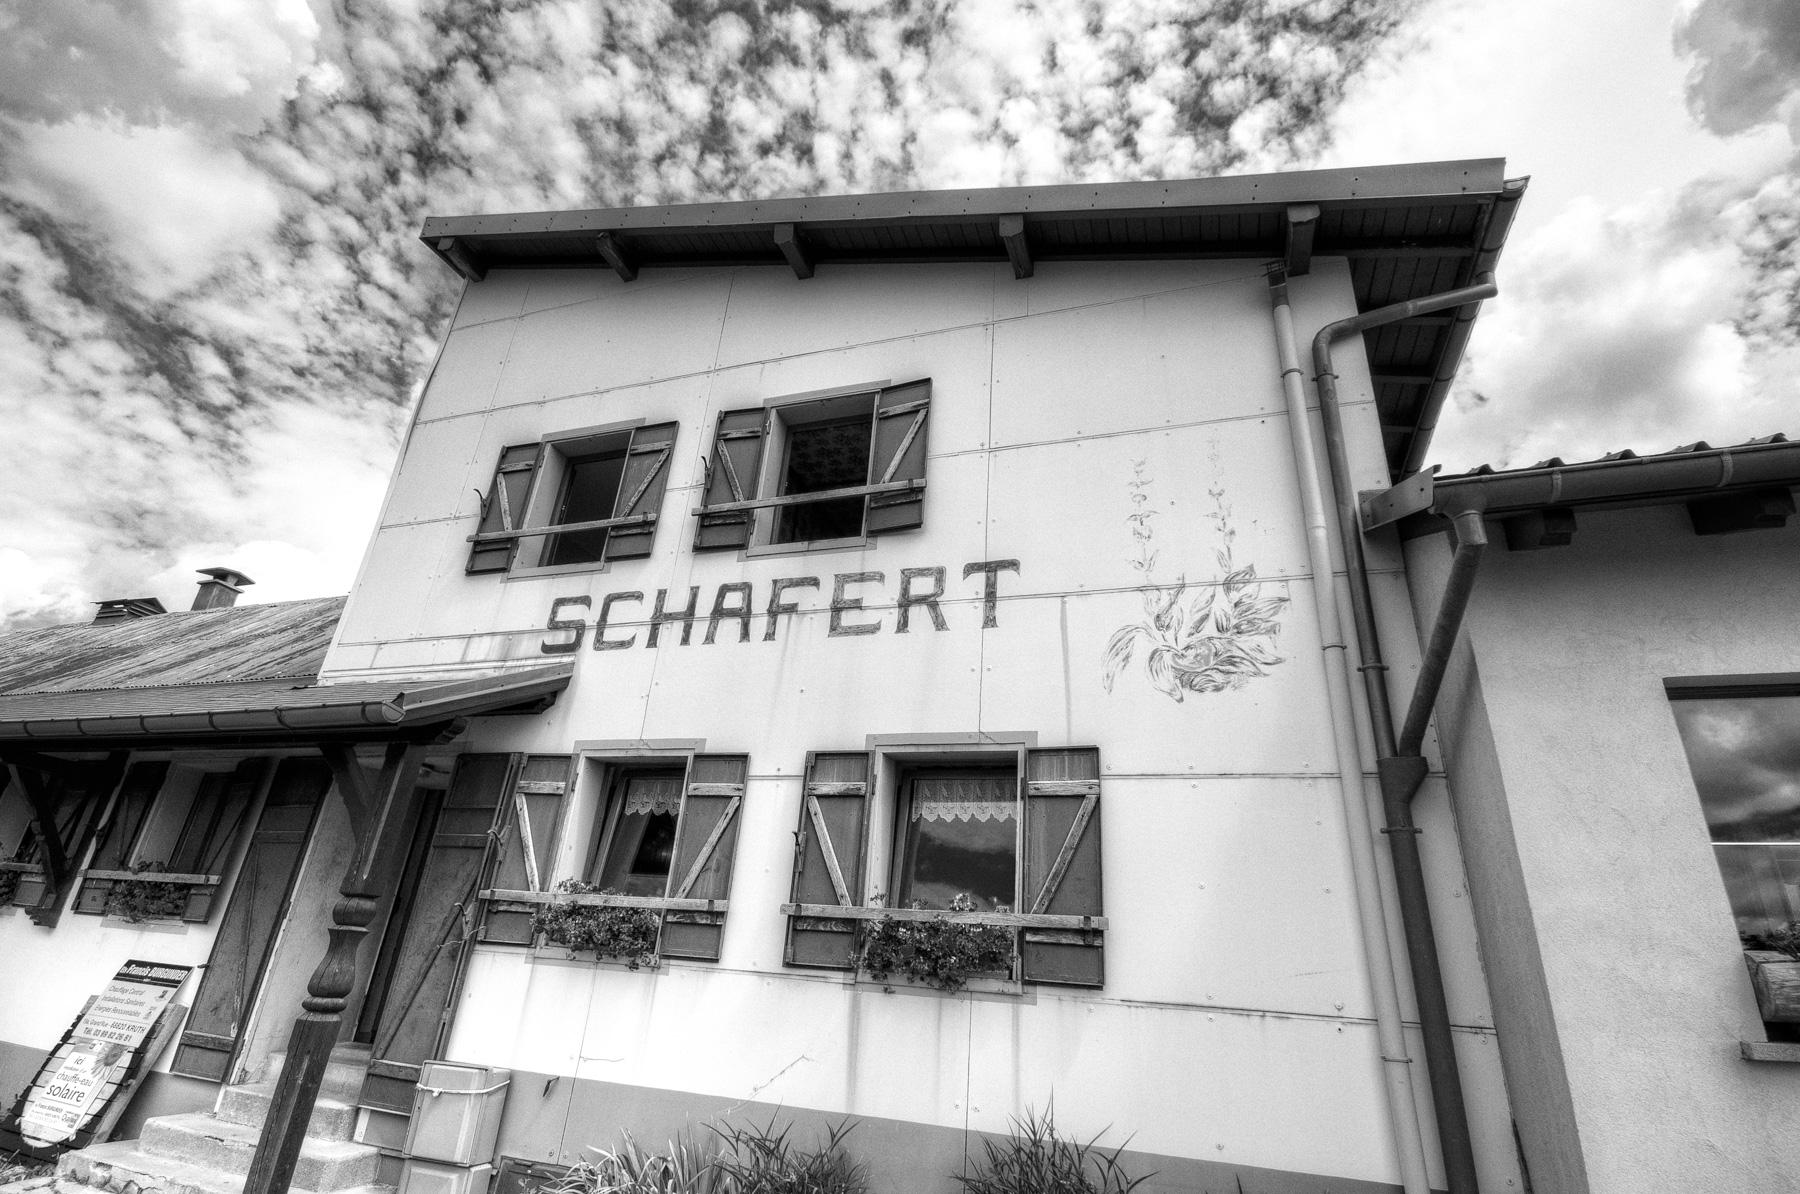 BW_Schafert